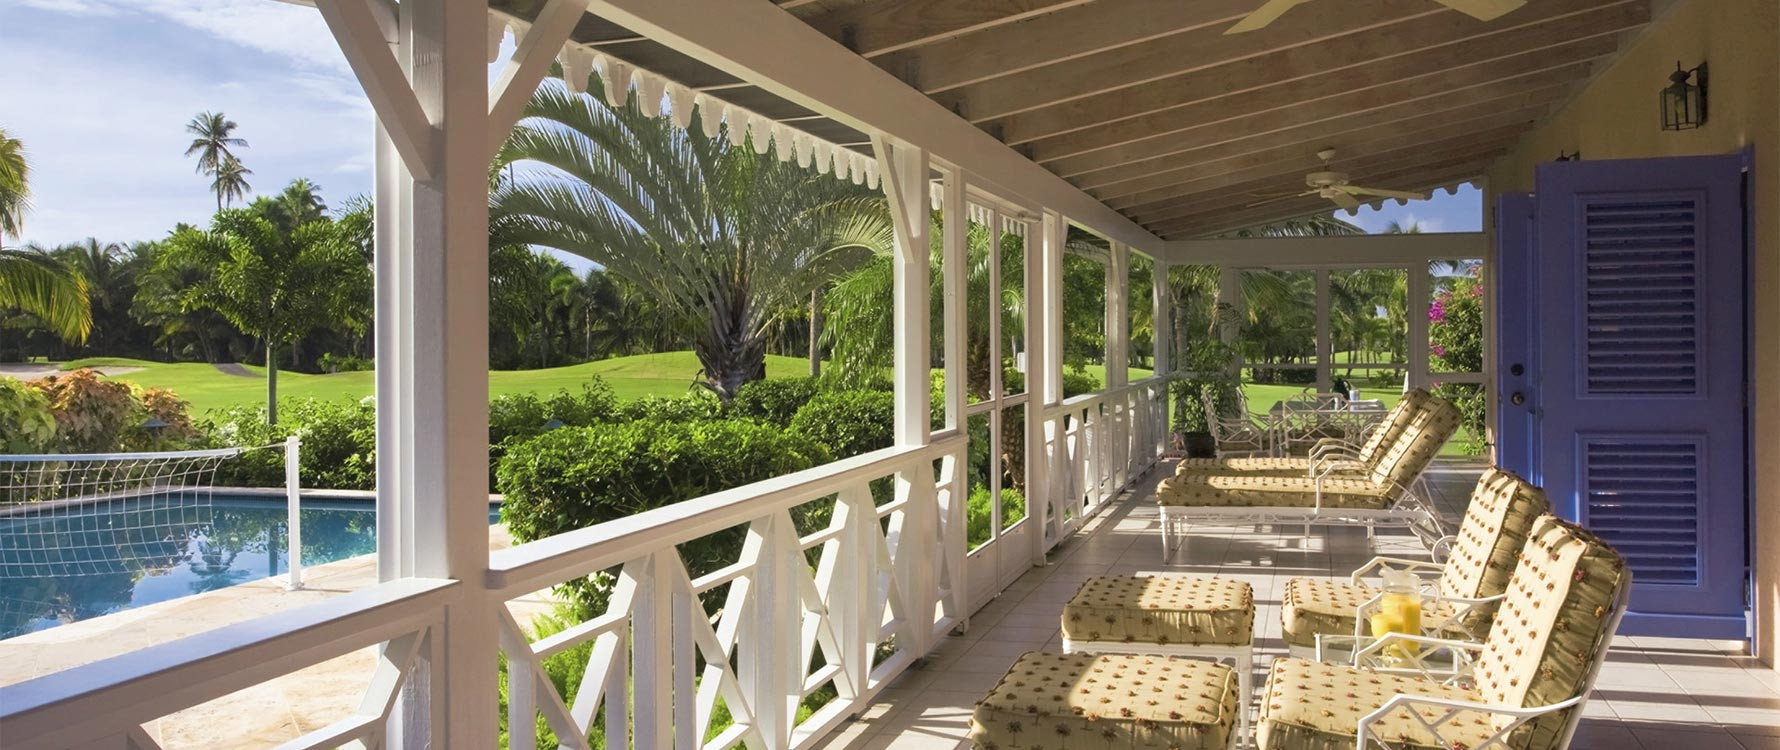 Screened veranda / lounge area